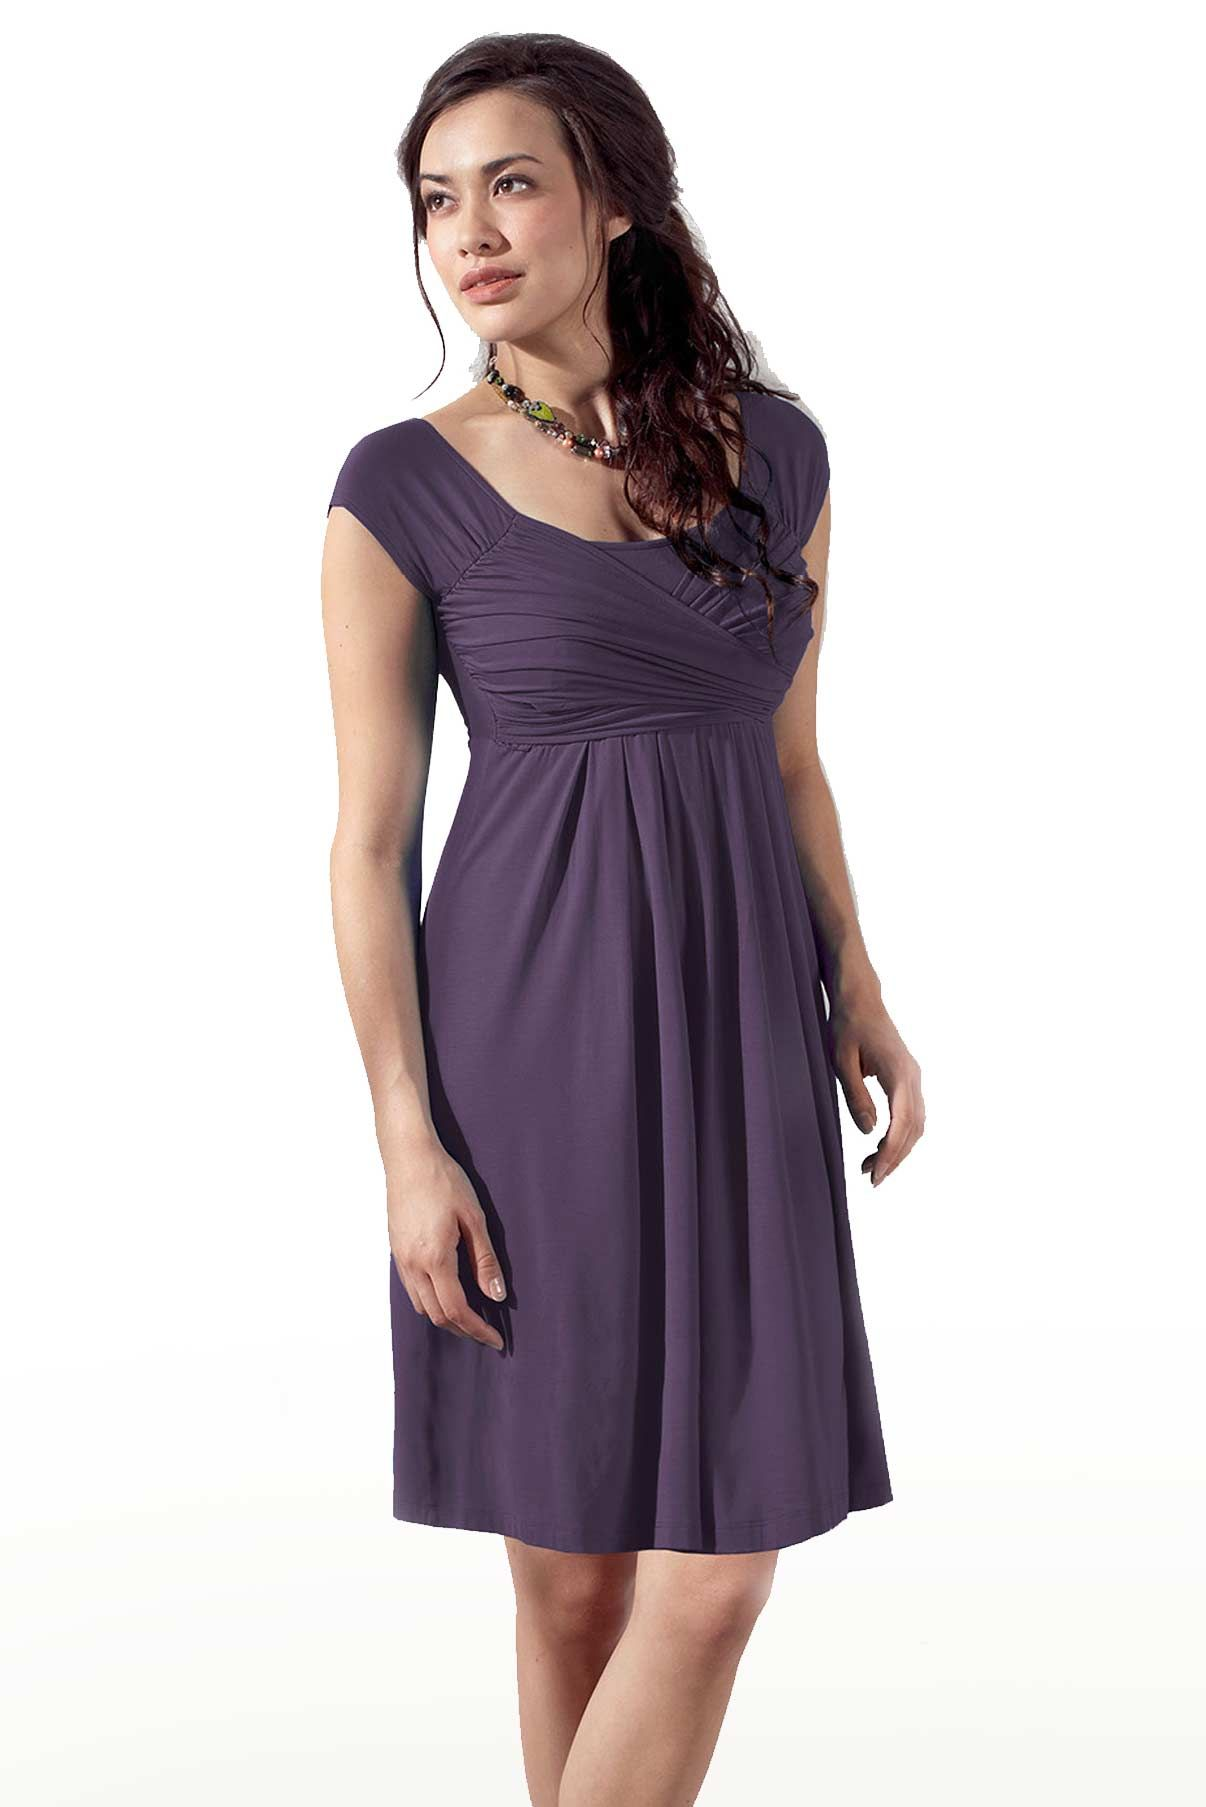 Mothers En Vogue Lola Mae Nursing Dress, Aubergine - Izzy\'s Mum ...